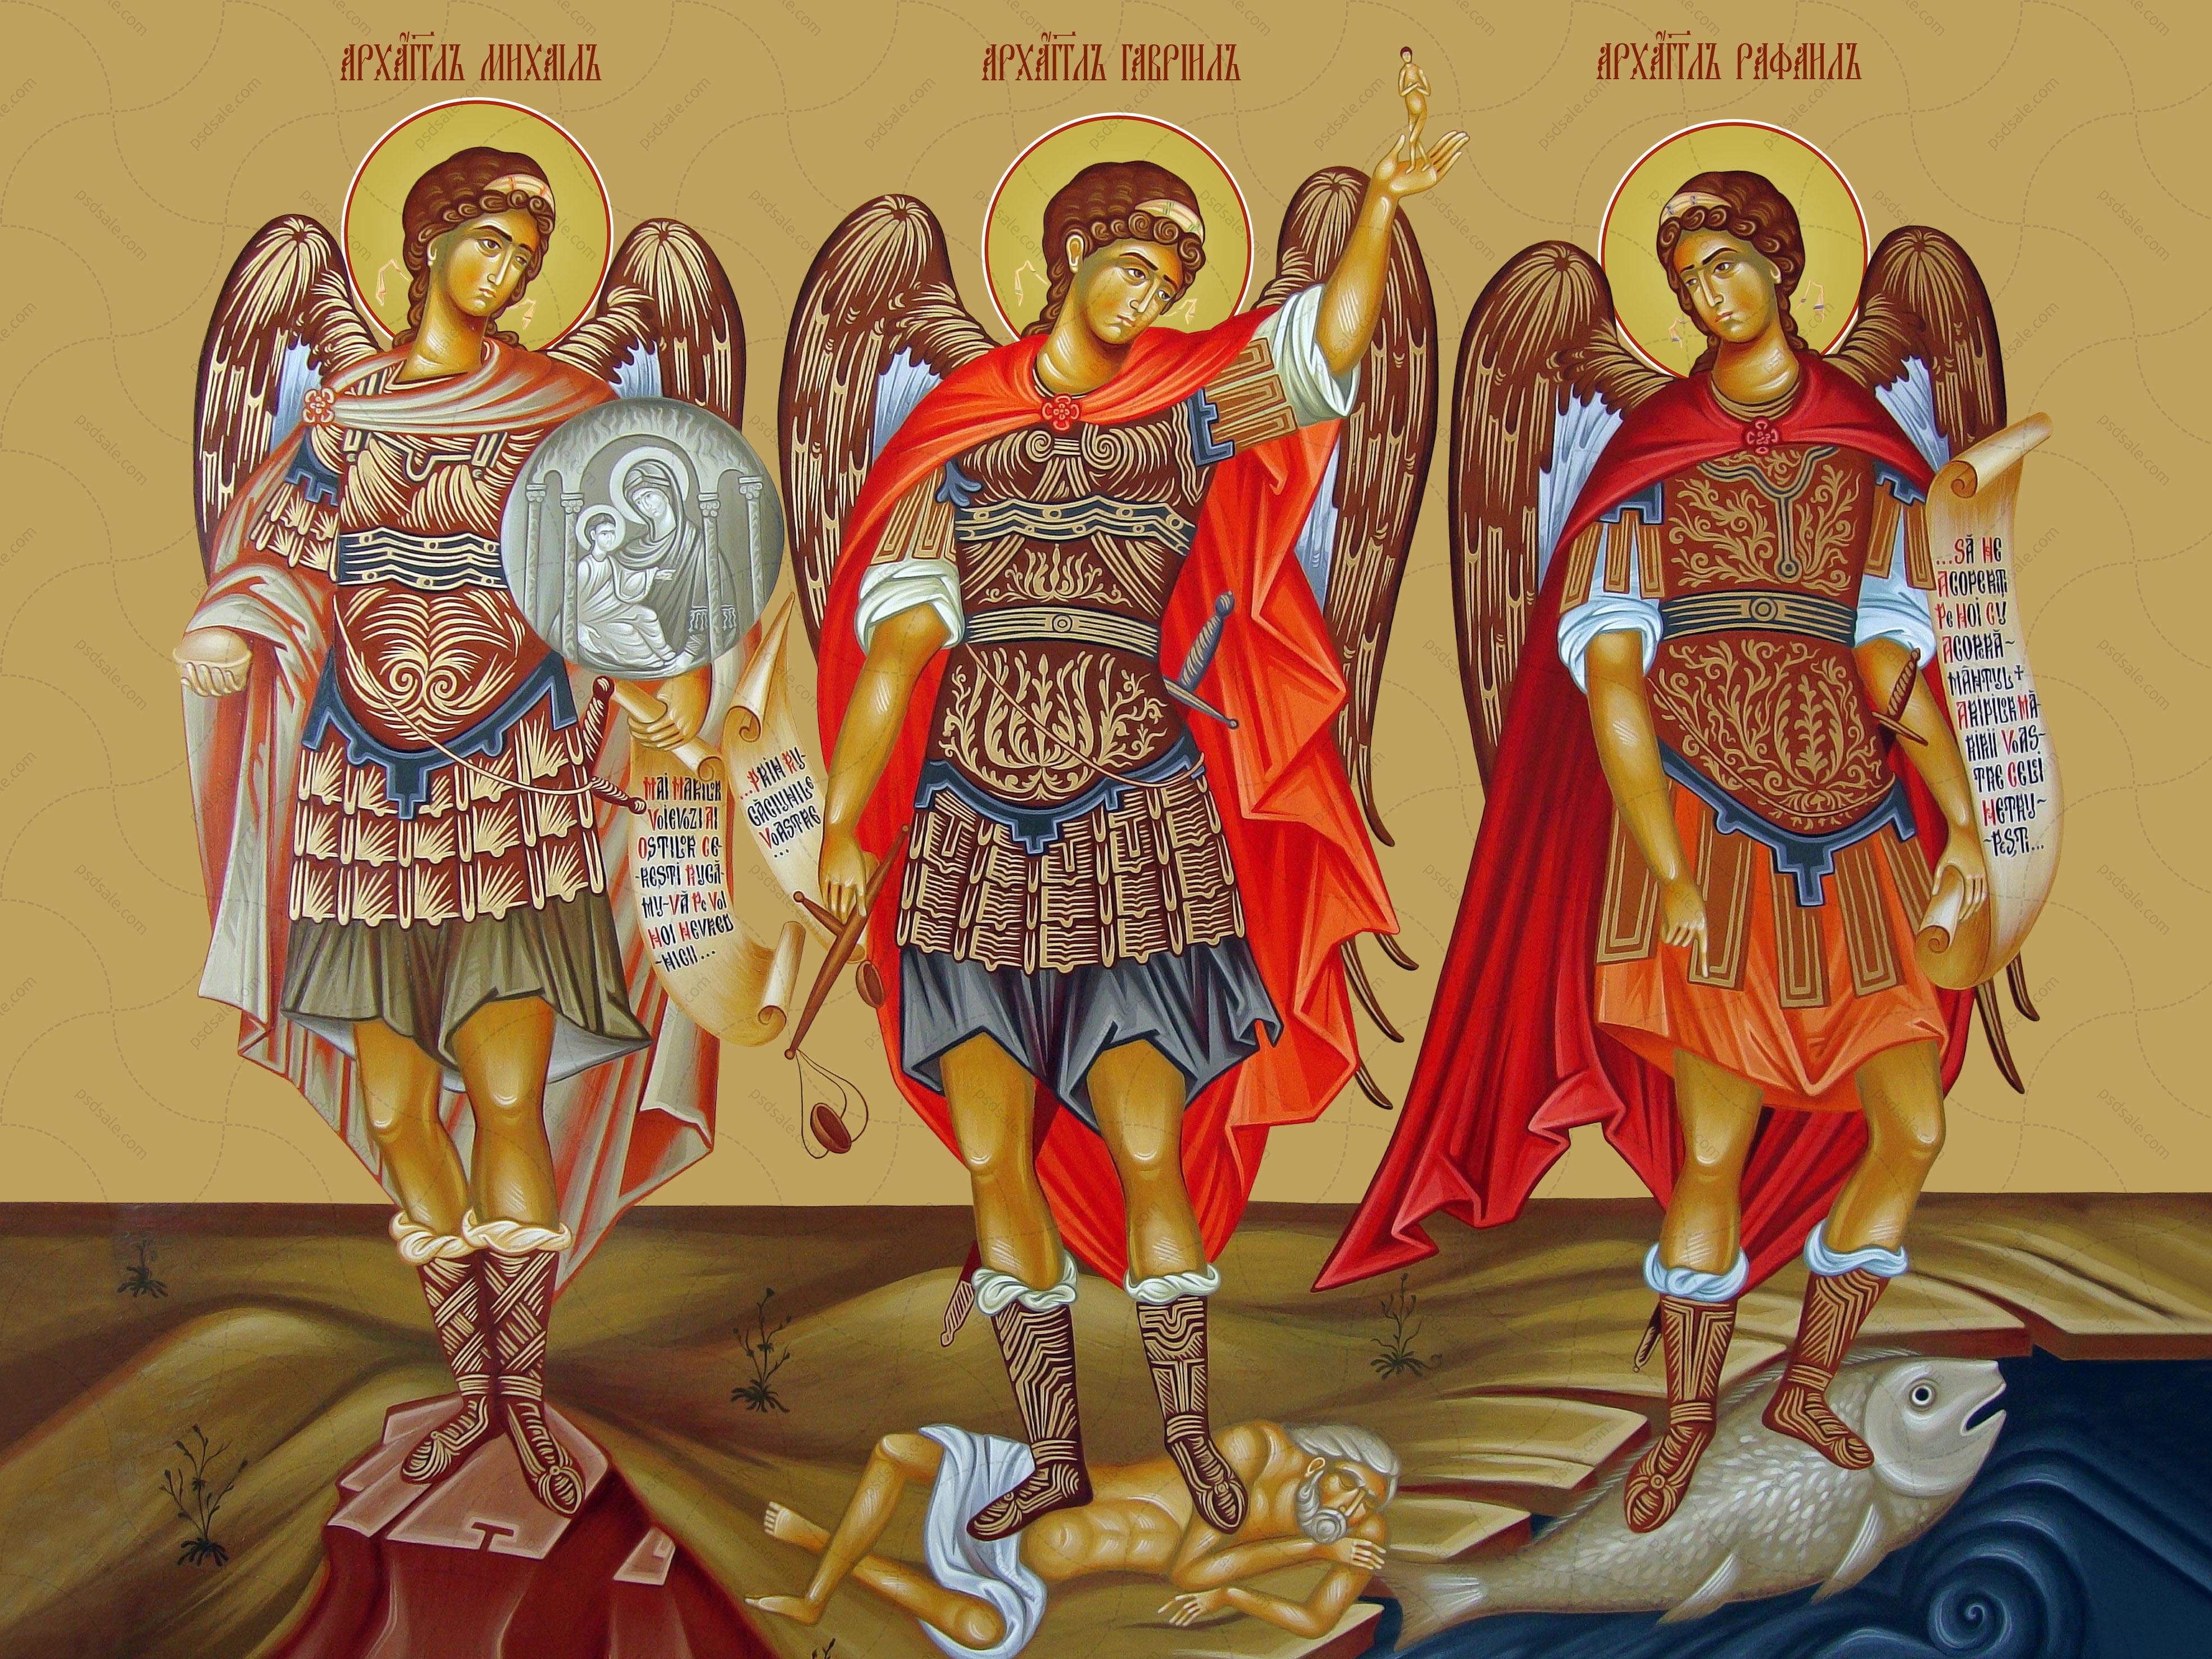 Архангелы Михаил, Гавриил и Рафаил